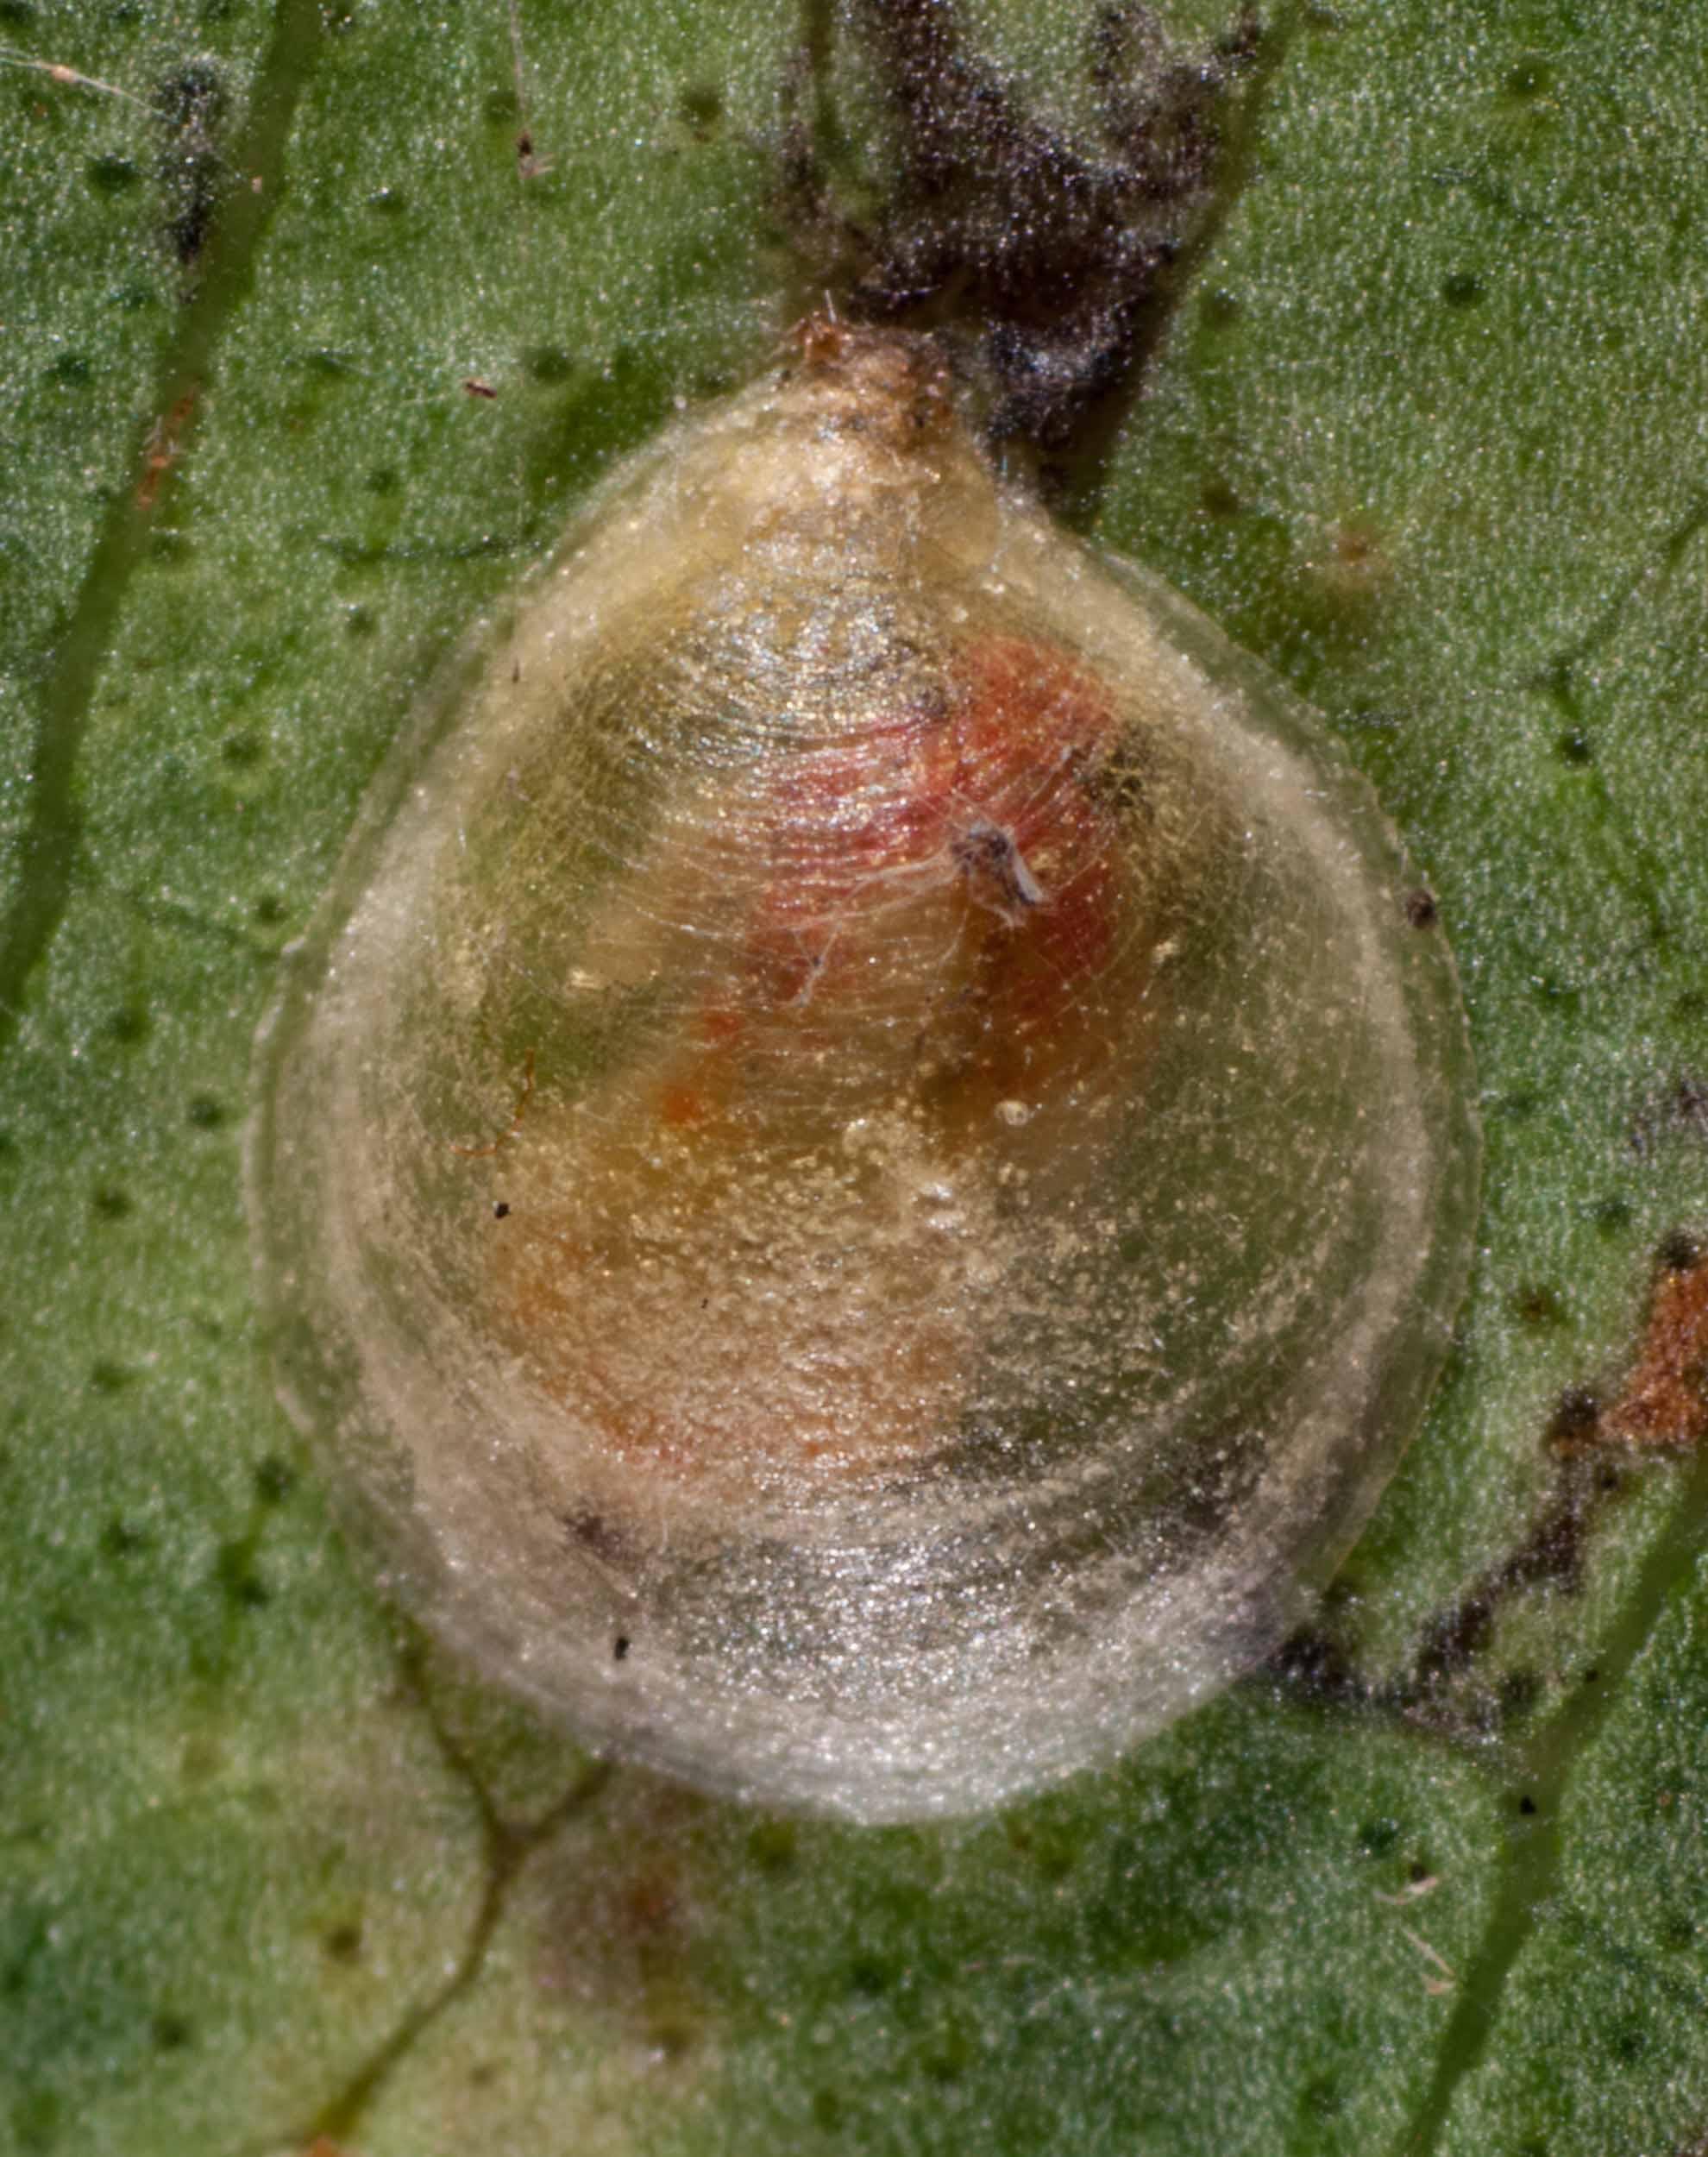 The  Hyalinaspis pallinidinota  nymph inside its lerp